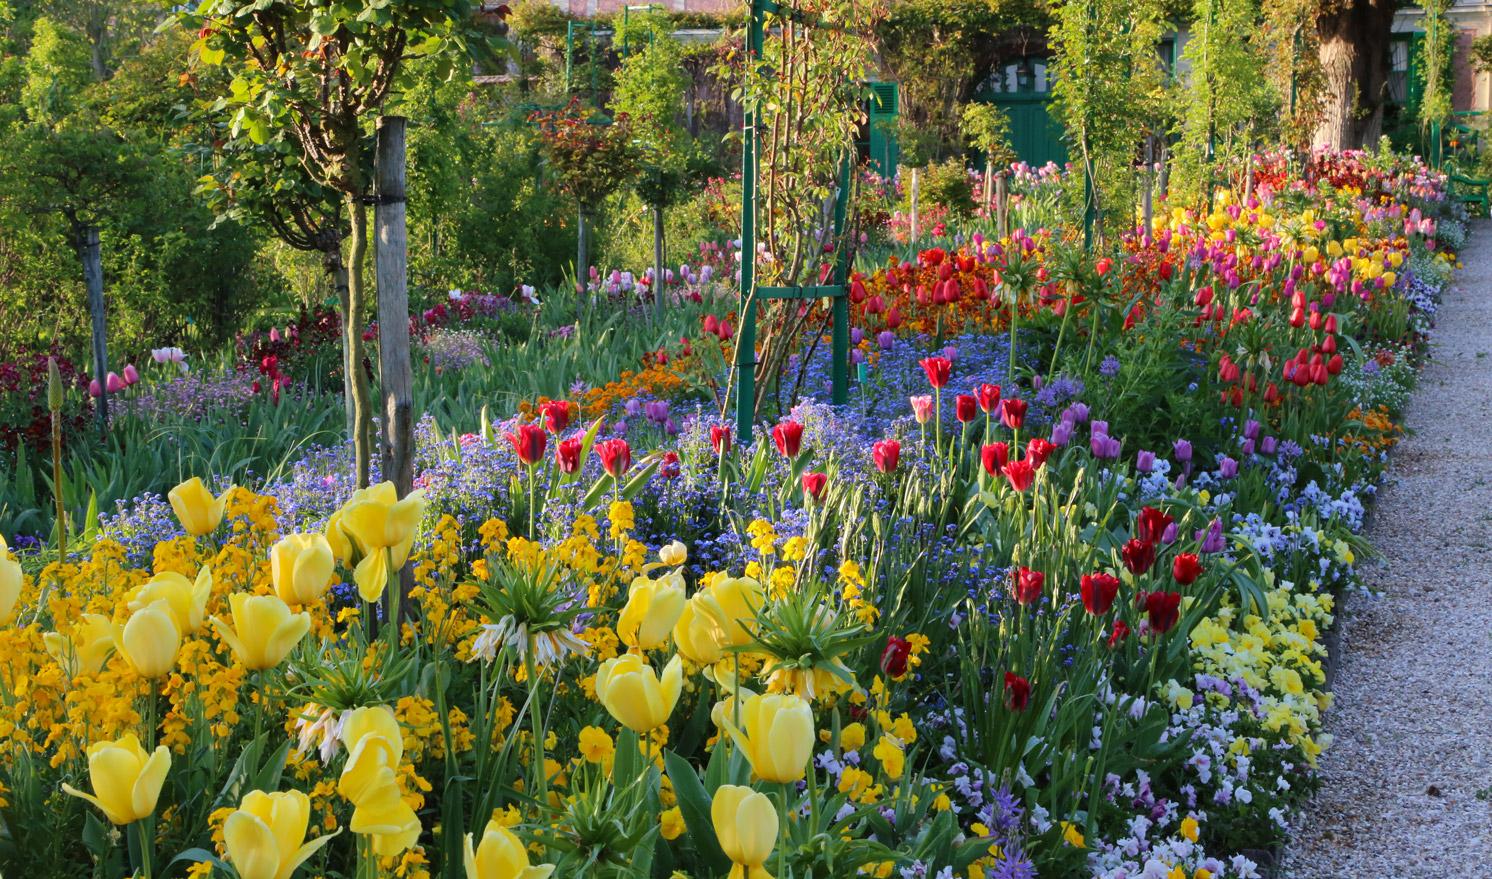 Flower garden paintings - Fondation Claude Monet Giverny Flowers Fondation Claude